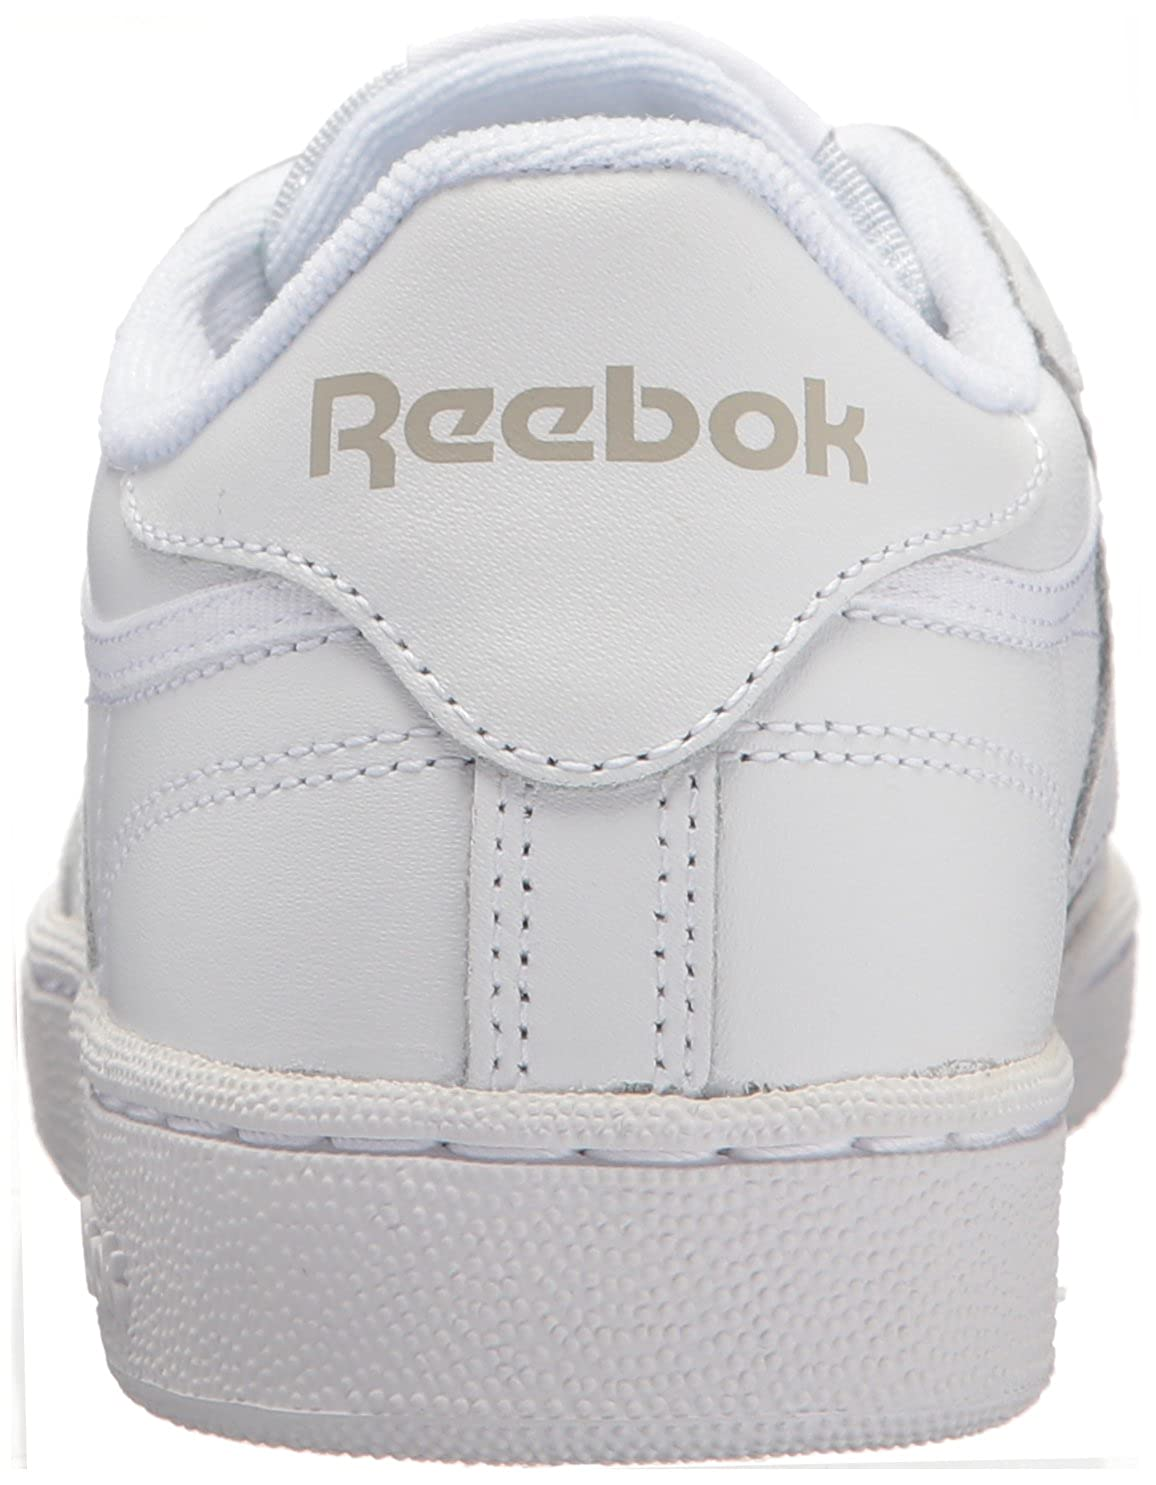 Reebok Classics Womens Club C 85 Sneakers